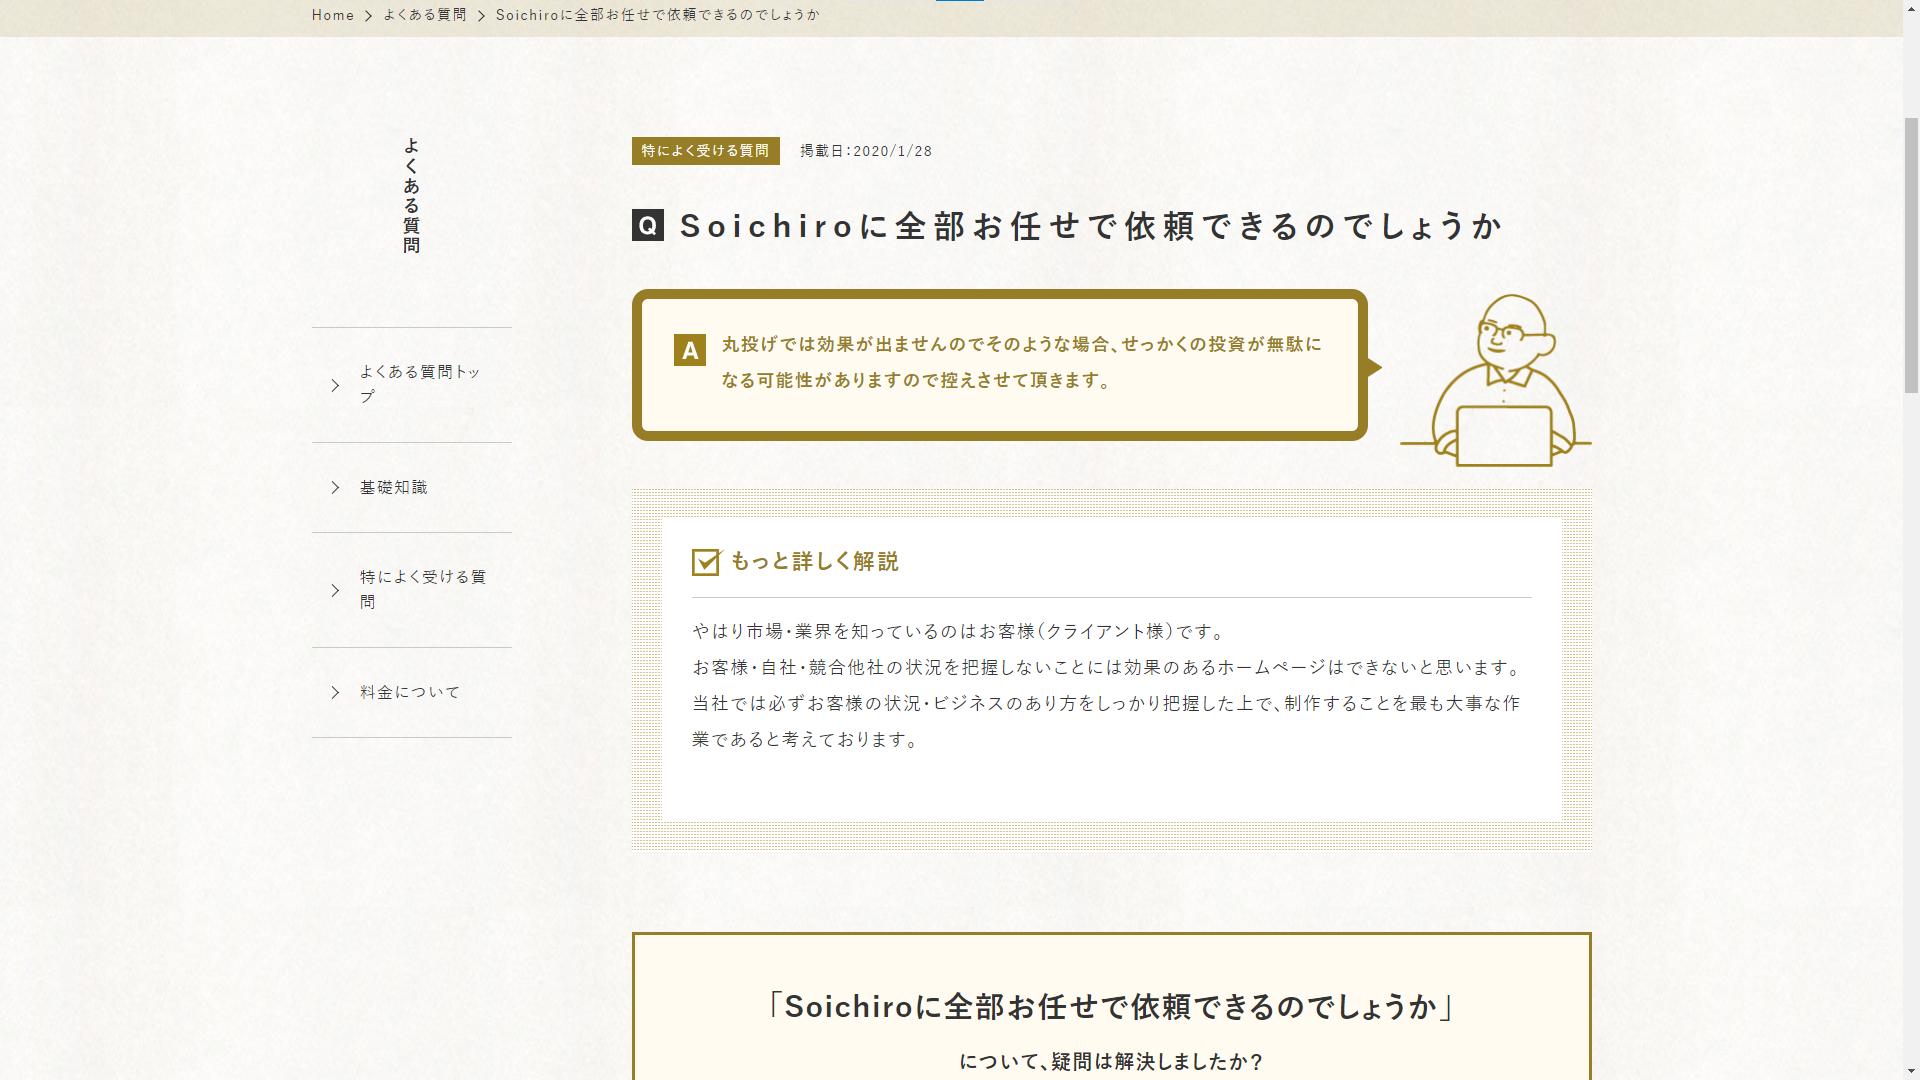 Soichiroのよくある質問ページ